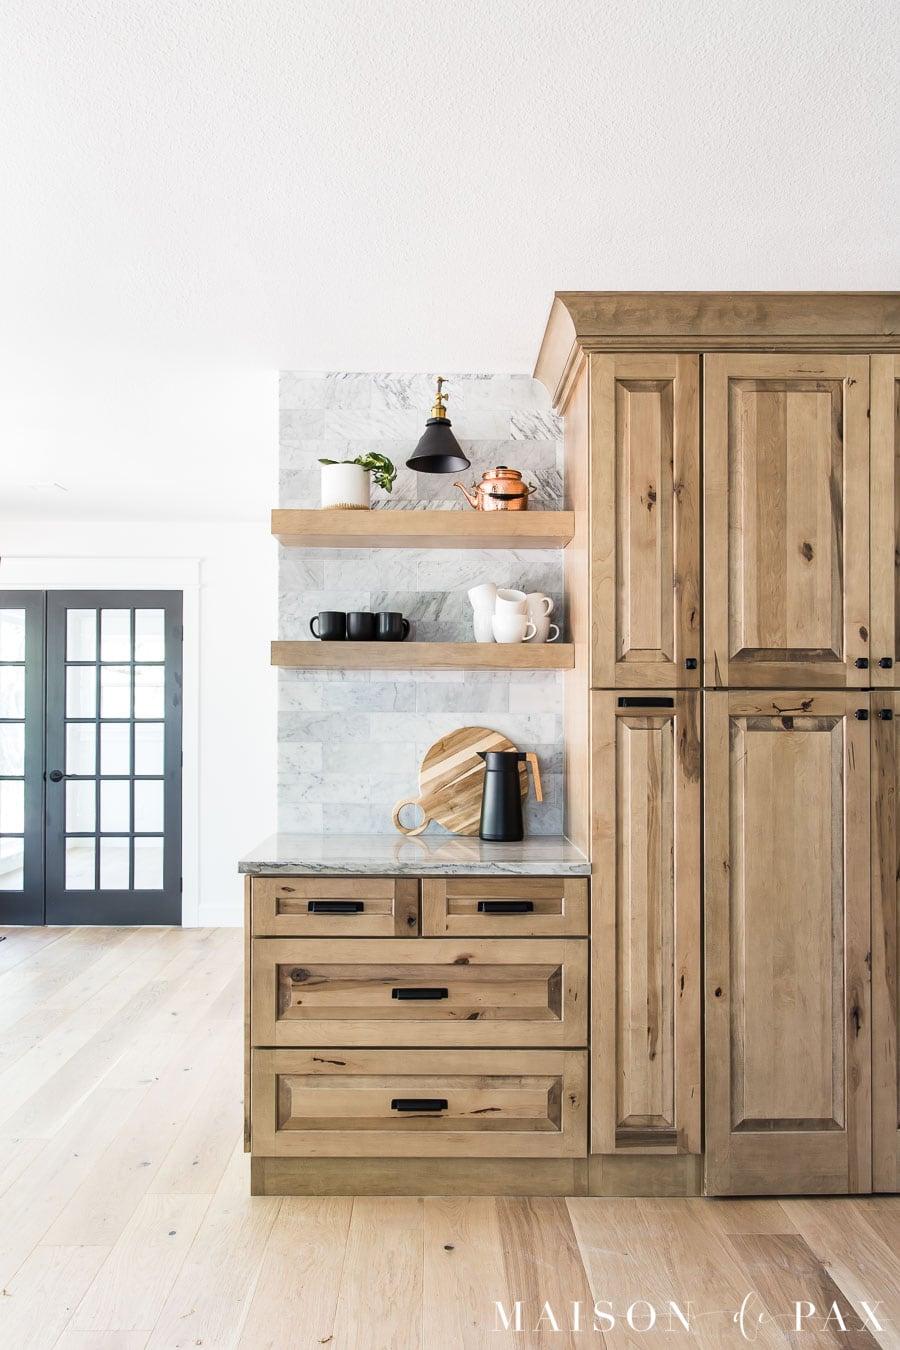 white oak wood floors with natural wood cabinets | Maison de Pax